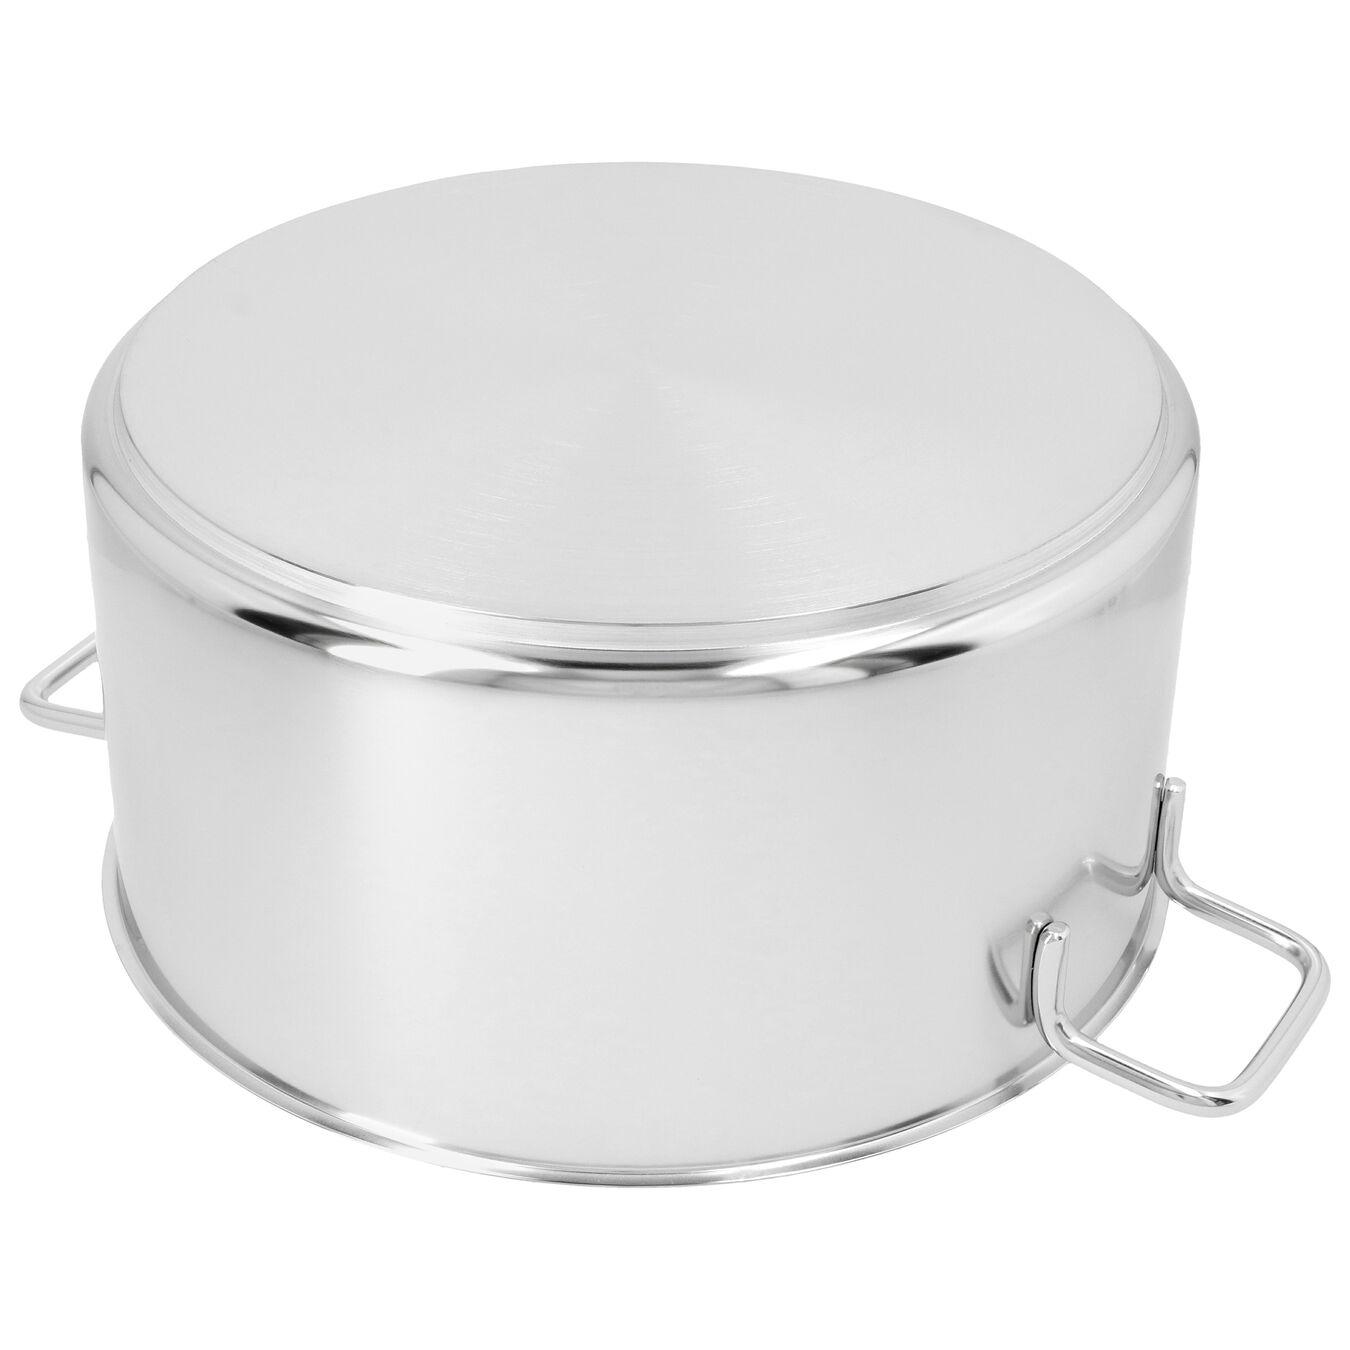 Kookpot met deksel 28 cm / 8,4 l,,large 4